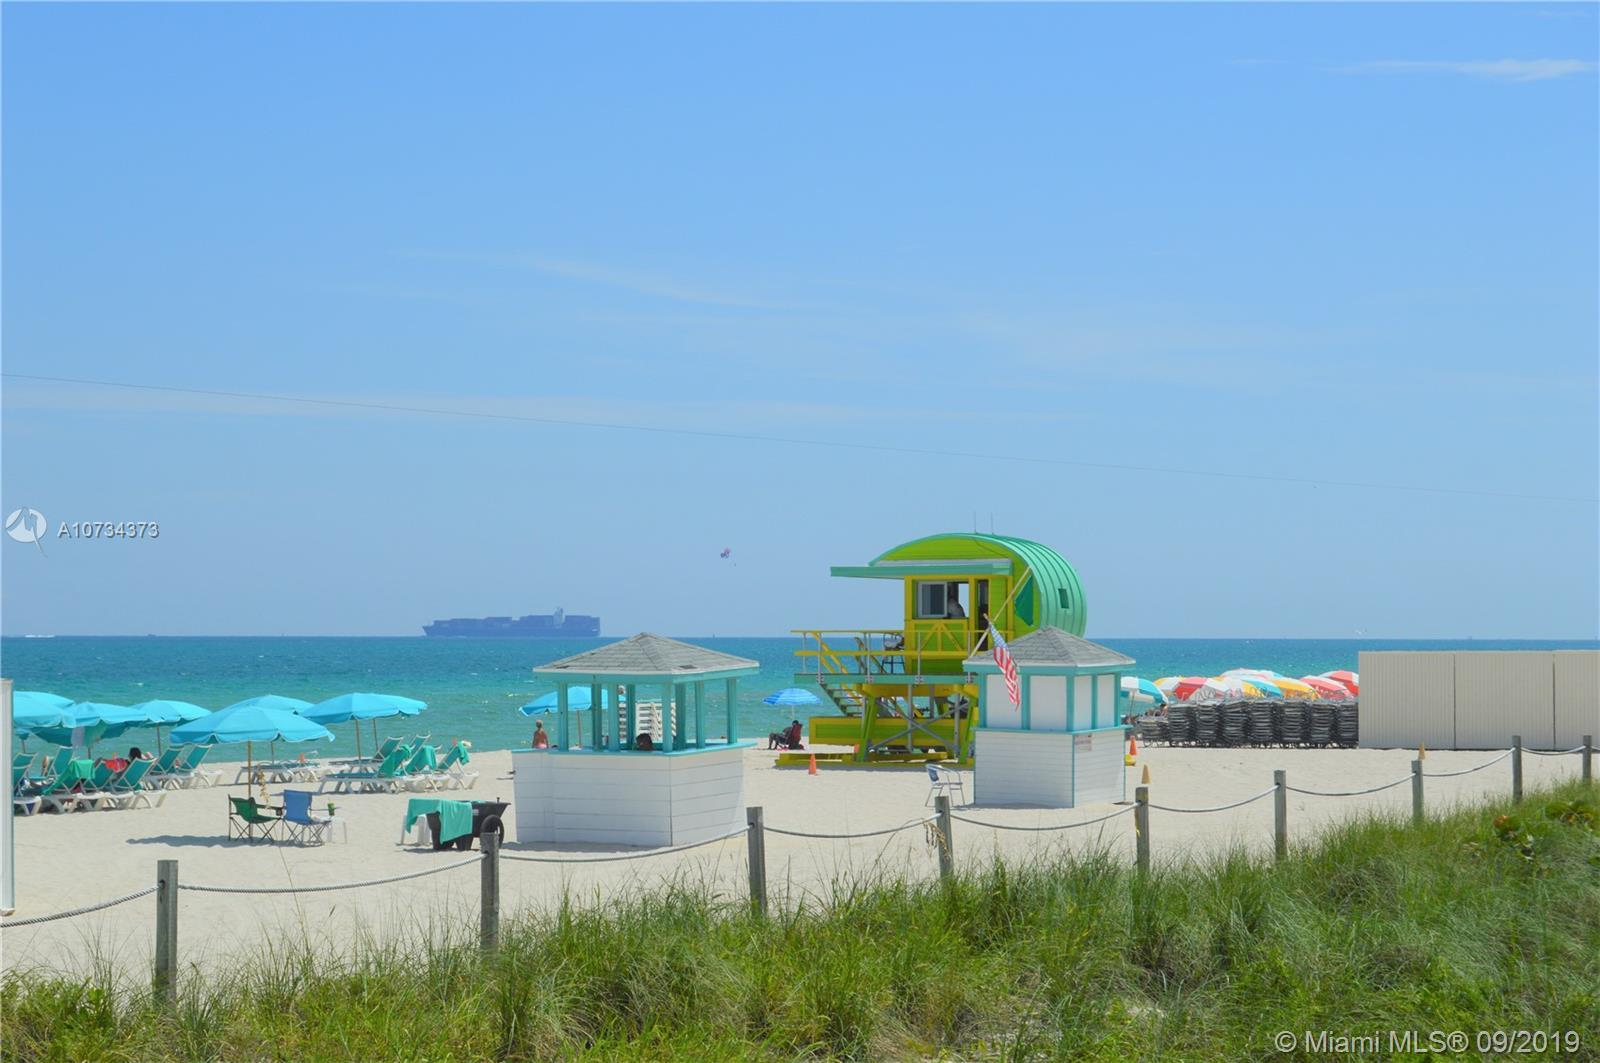 Miami Beach spacious 2 bedroom, 2 bathroom condo, walking distance to the white sands of Miami Beach